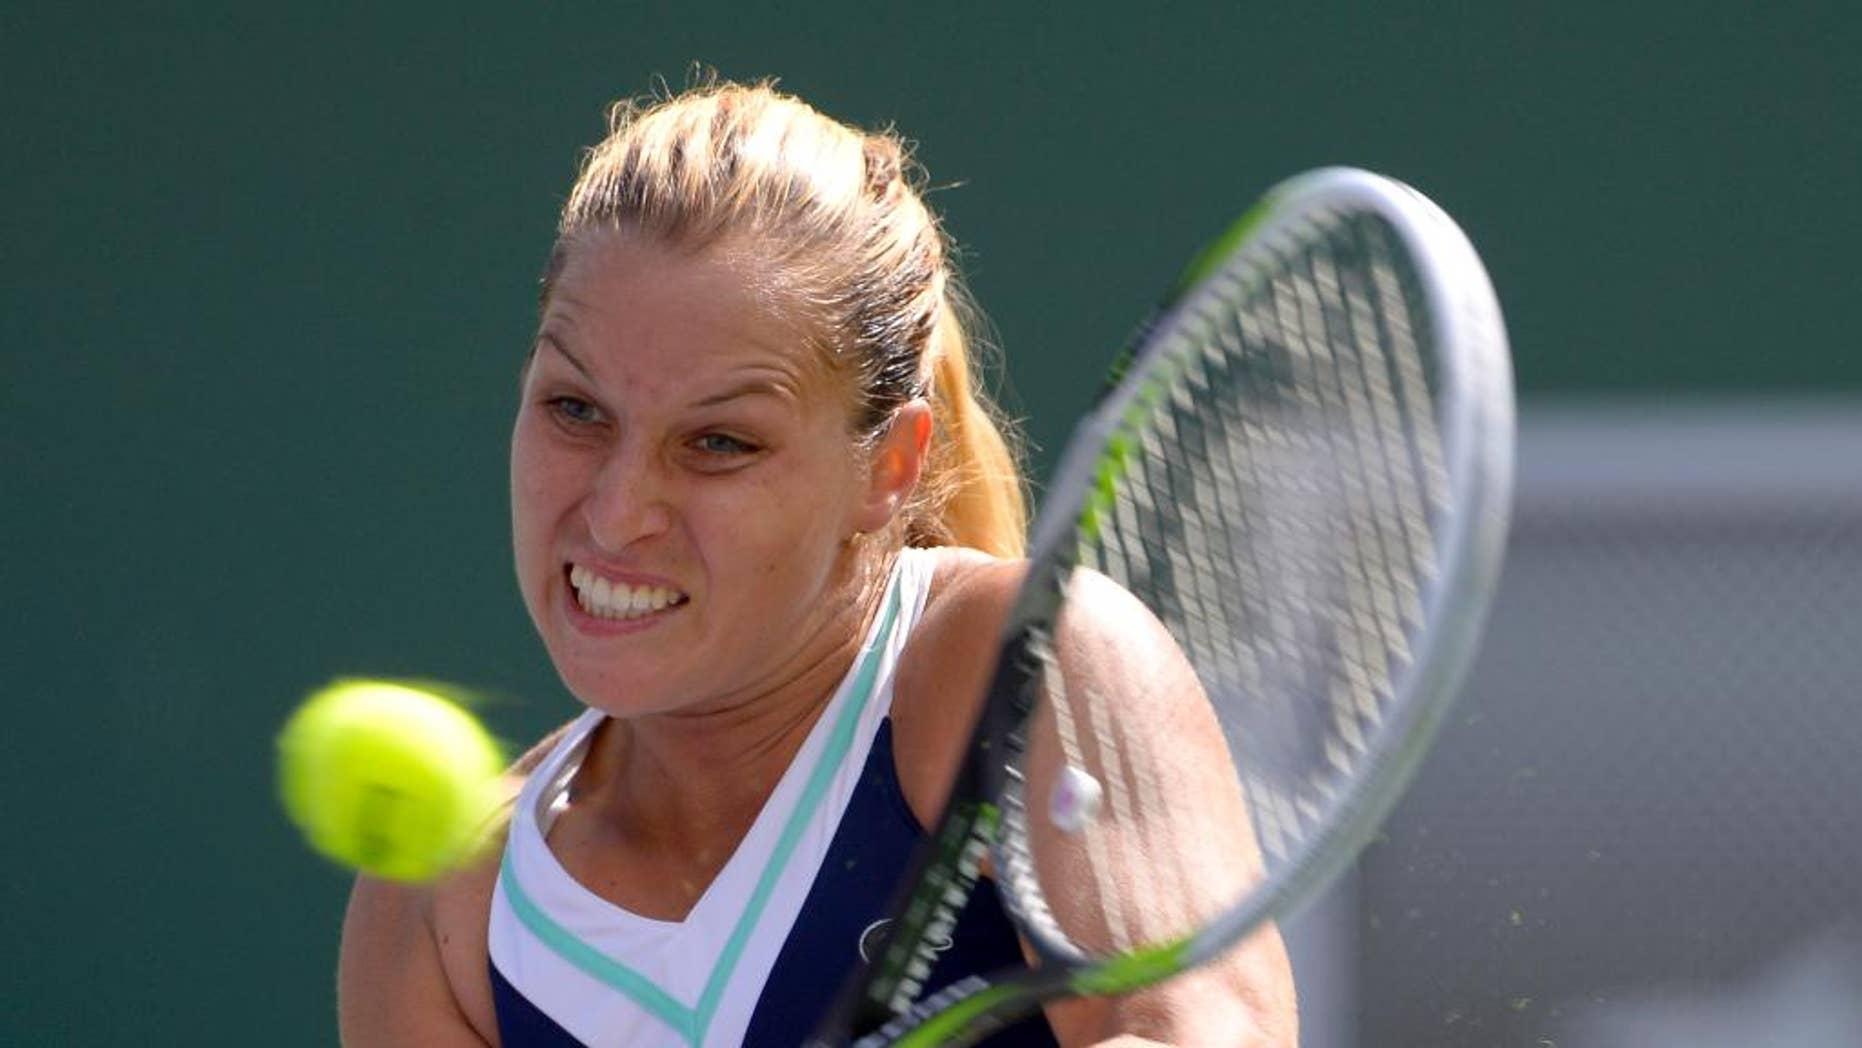 Dominika Cibulkova, of Slovakia, returns a shot to Li Na, of China, during a quarterfinal match at the BNP Paribas Open tennis tournament, Thursday, March 13, 2014 in Indian Wells, Calif. (AP Photo/Mark J. Terrill)